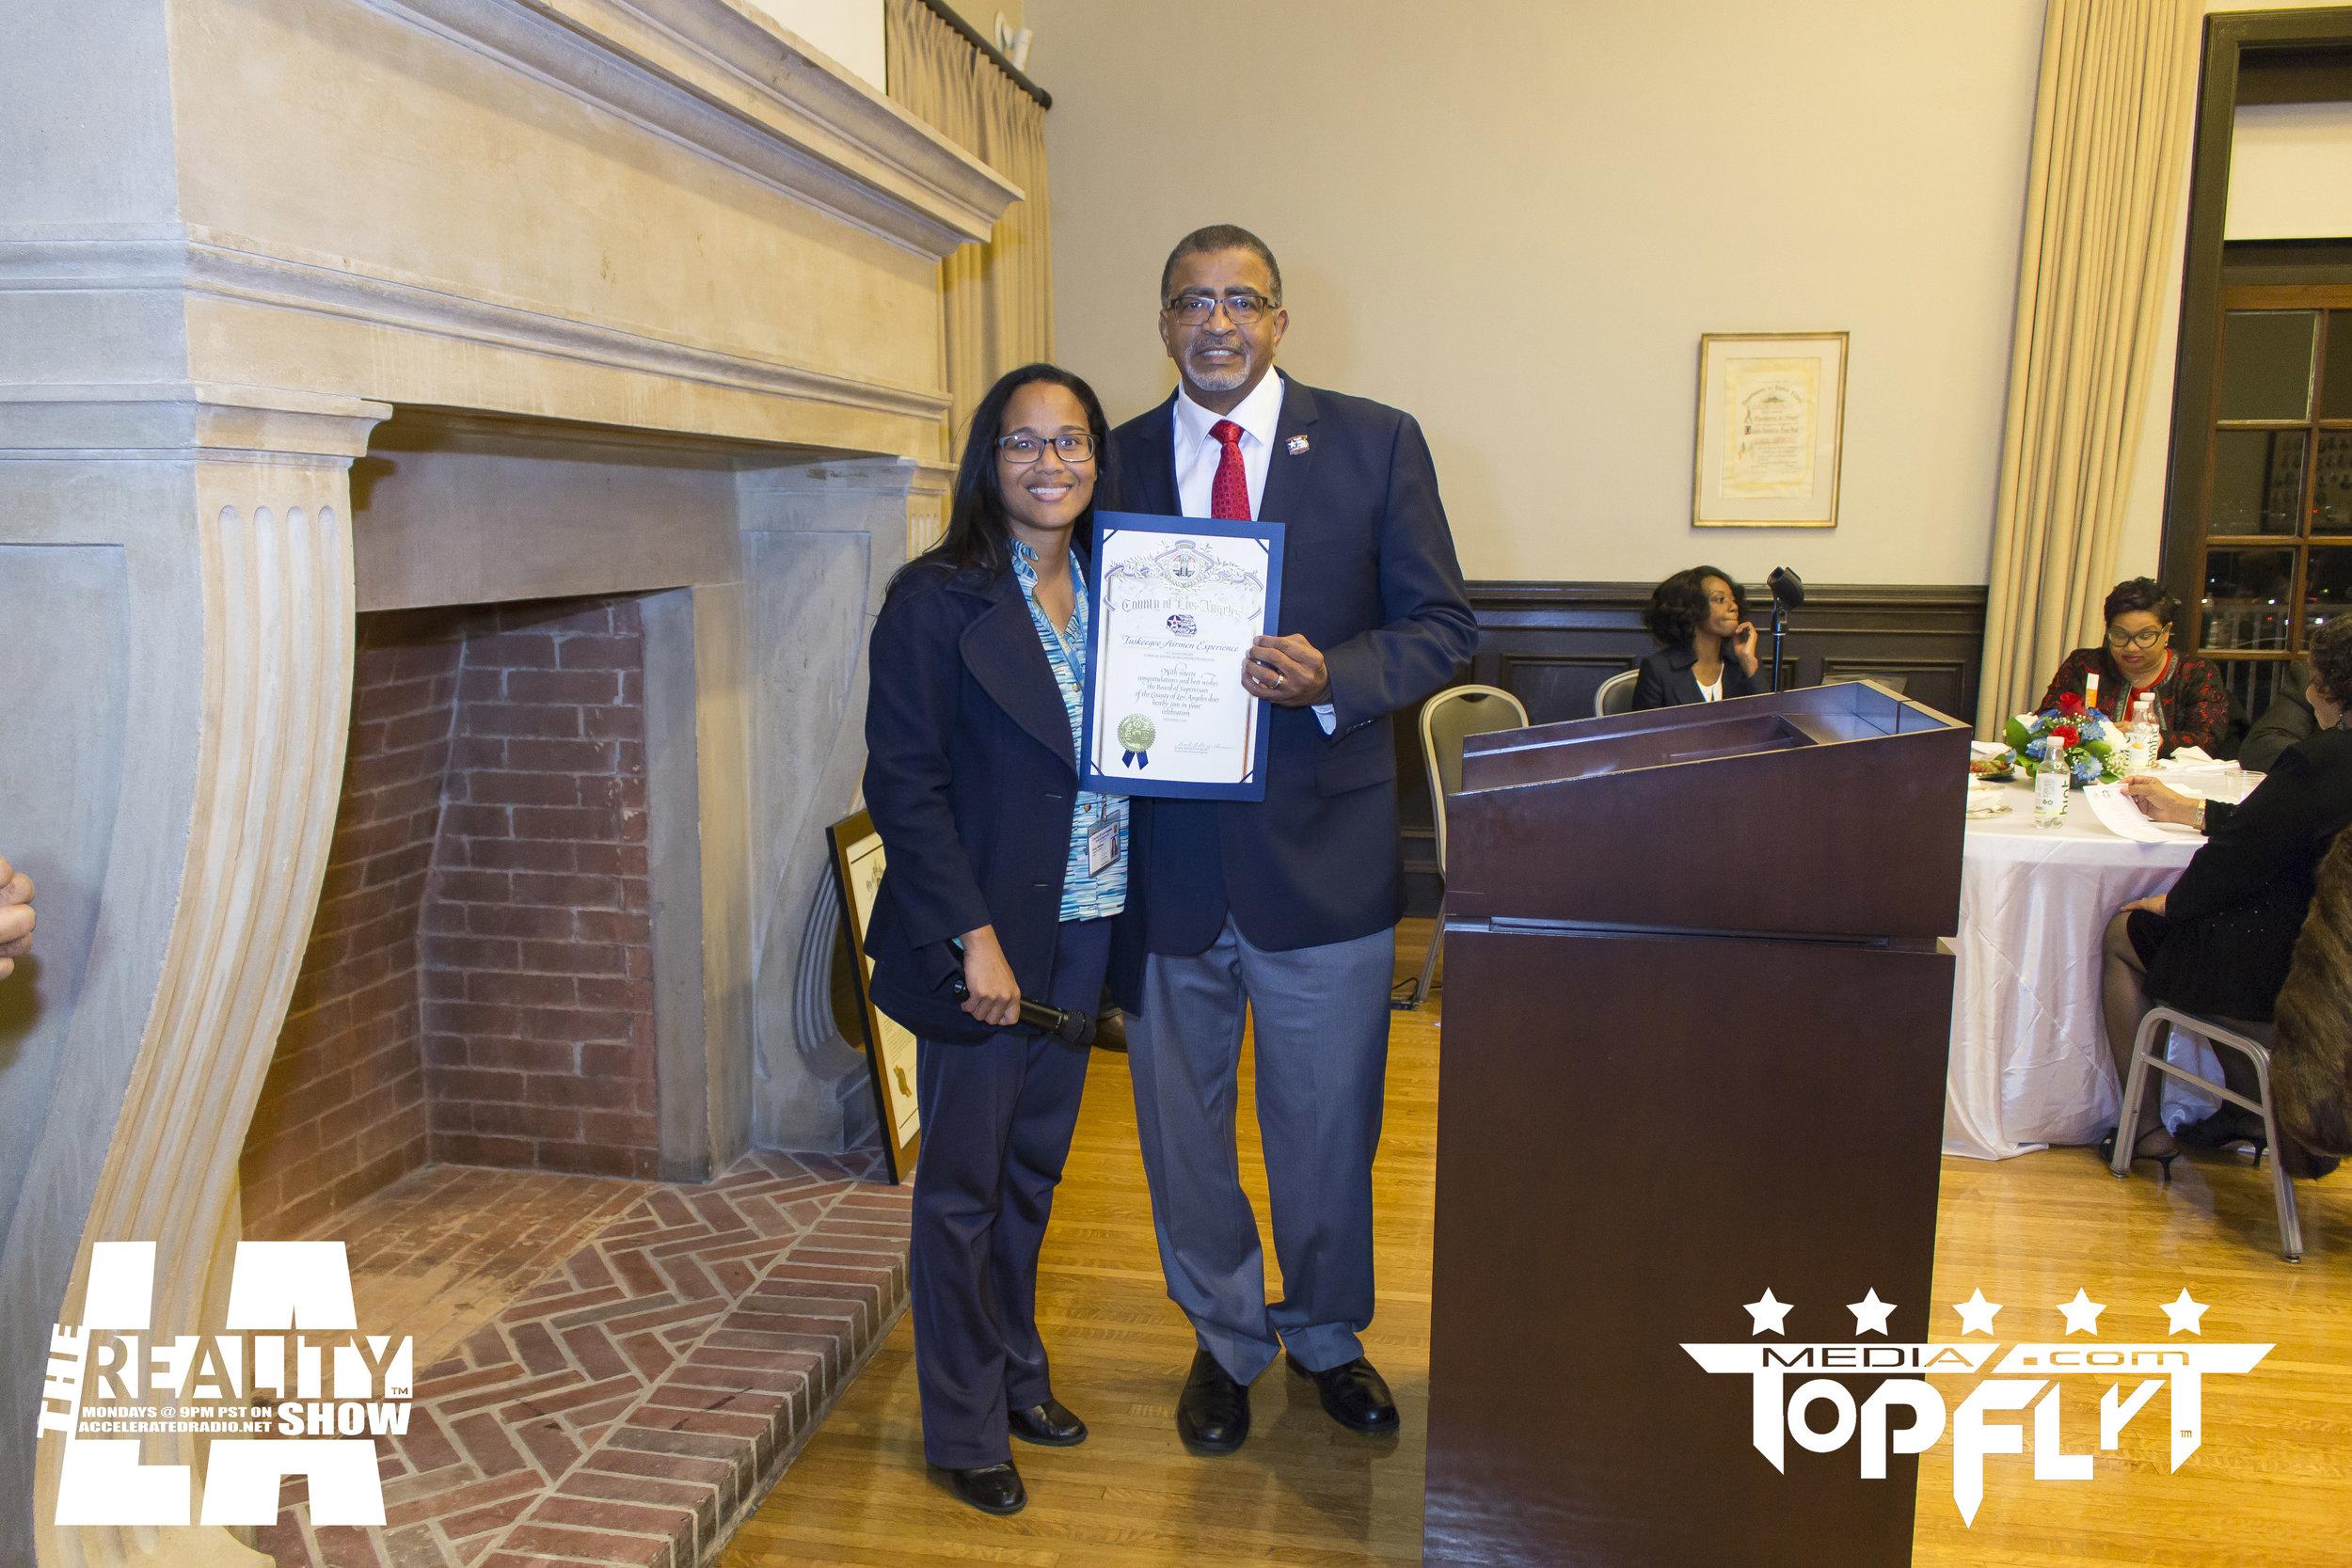 The Reality Show LA - Tuskegee Airmen 75th Anniversary VIP Reception_138.jpg